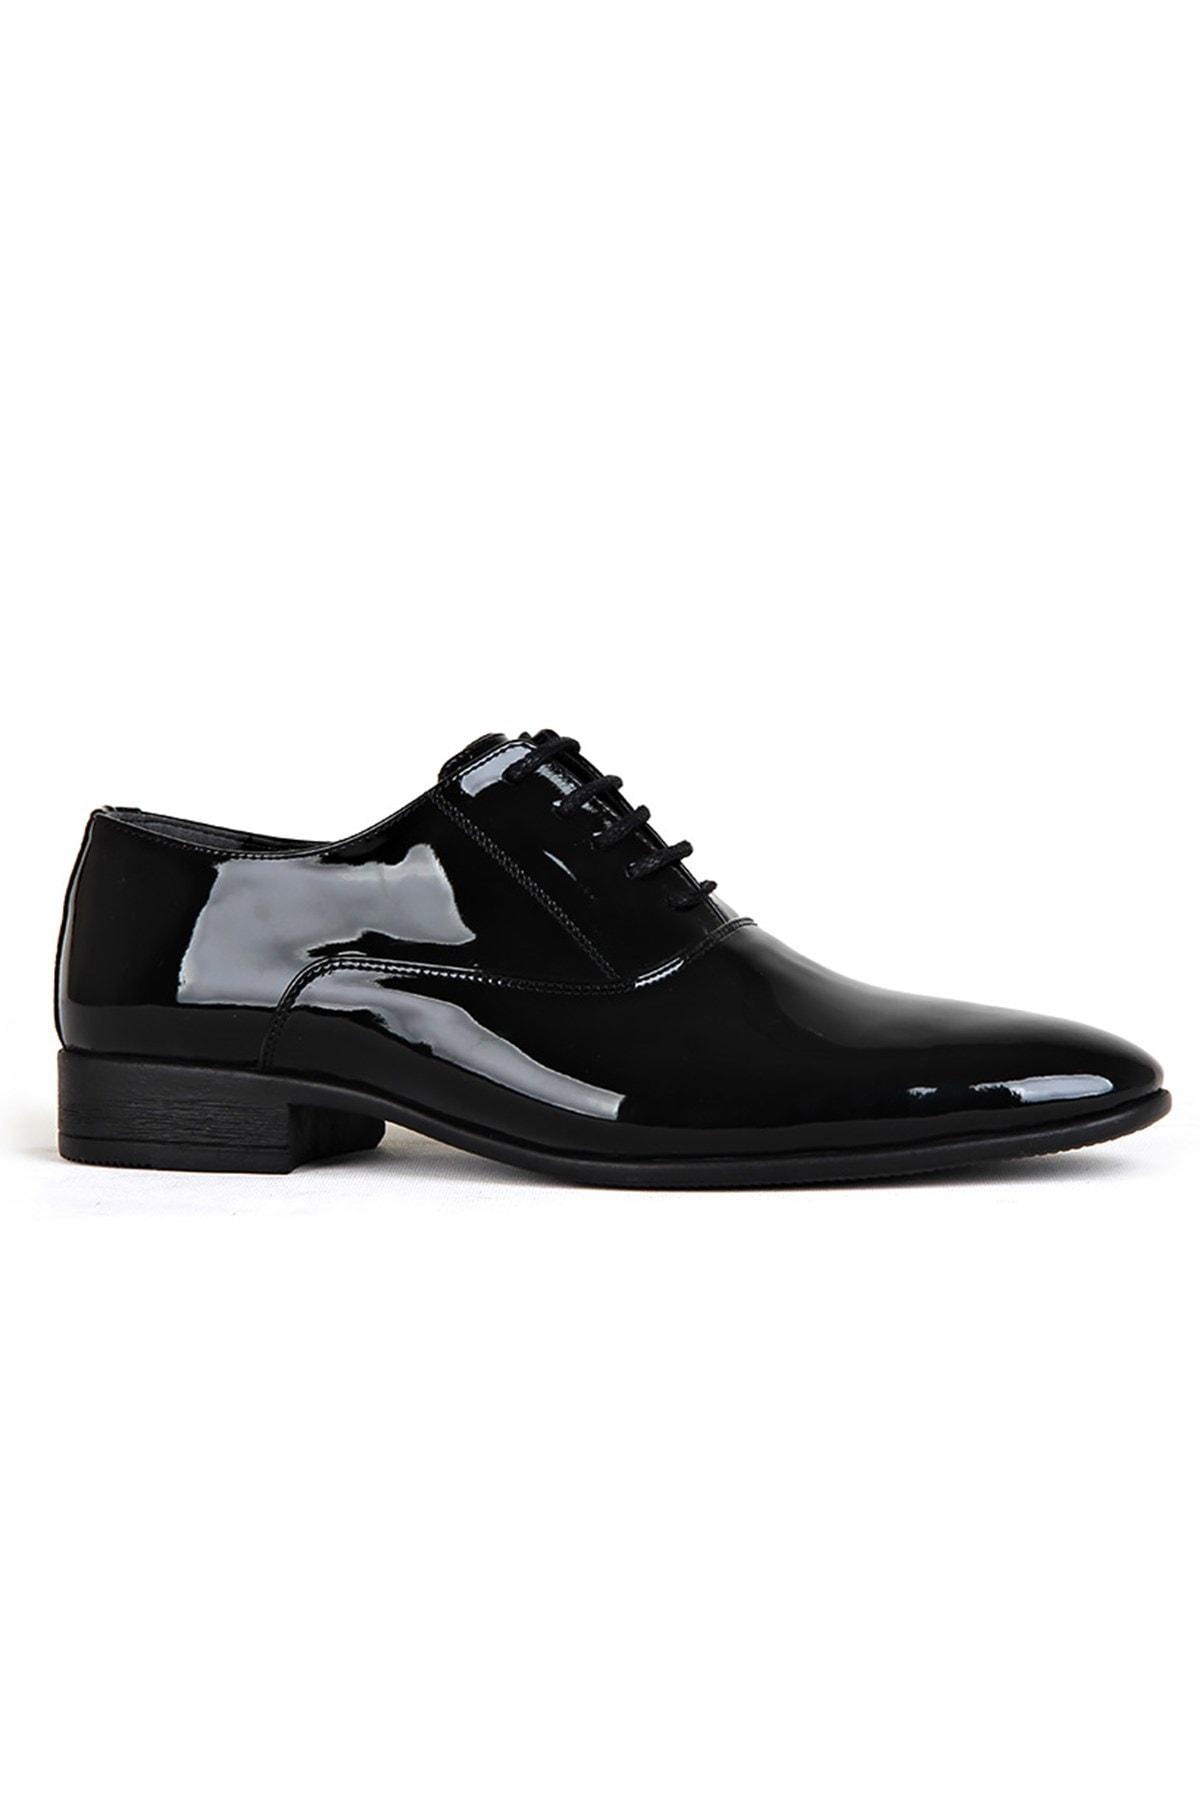 Black Mens Classic Shoes Men Casual Fashion Slip On Flat Dress Italian Style Wedding